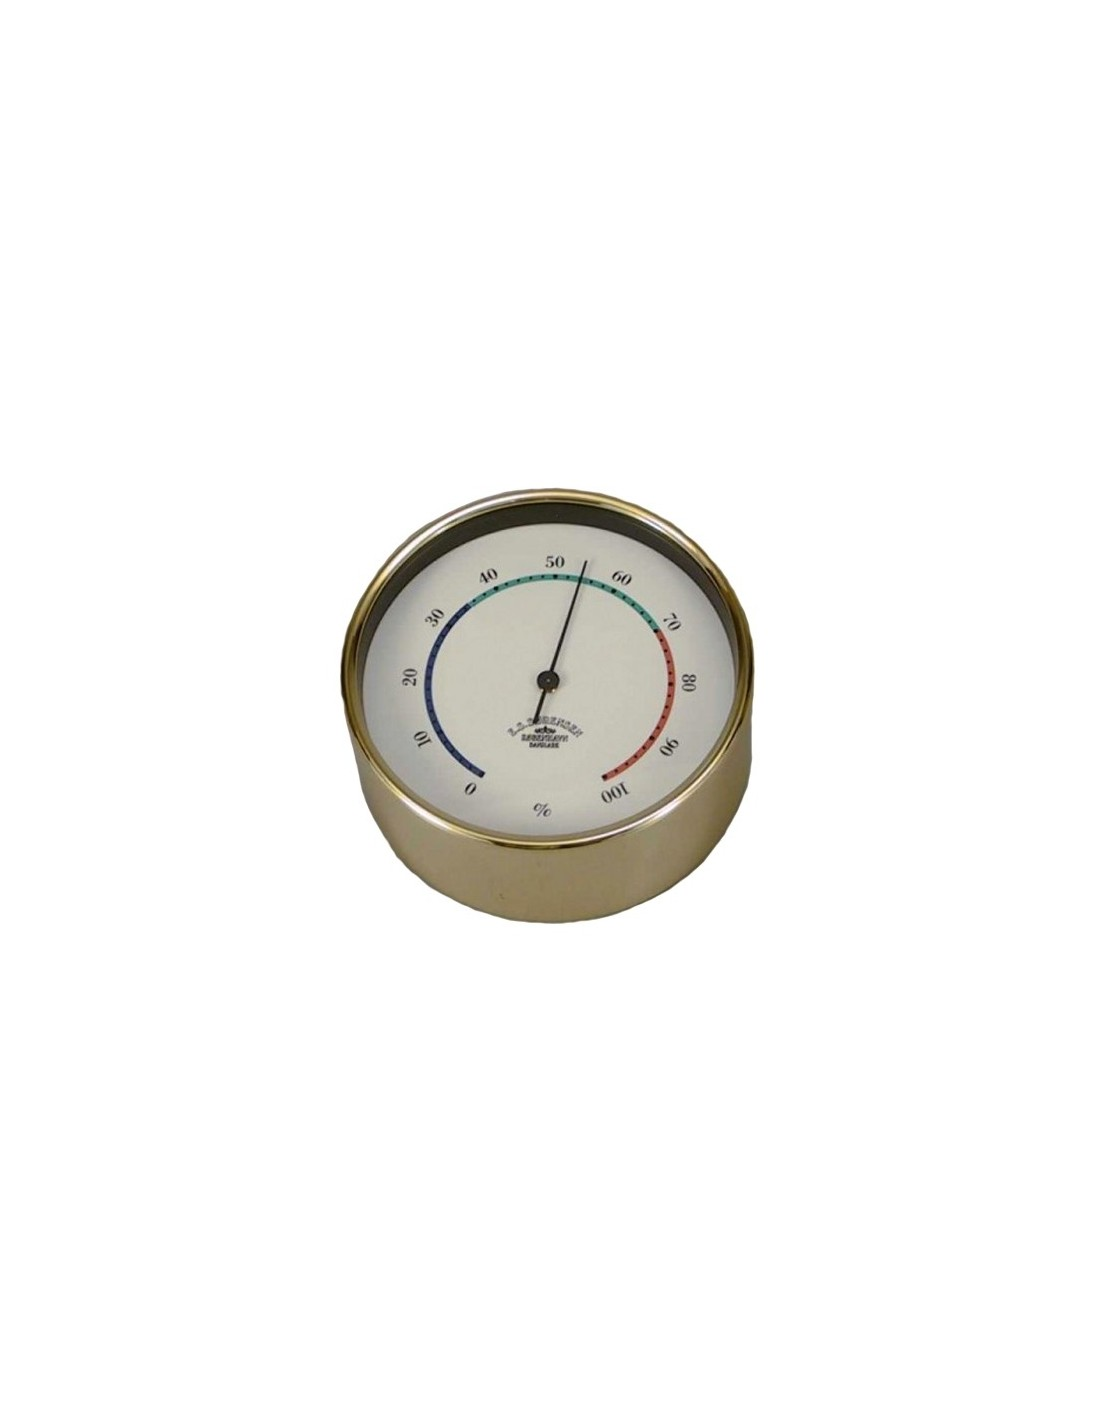 Hygrometer Mini - 90 mm